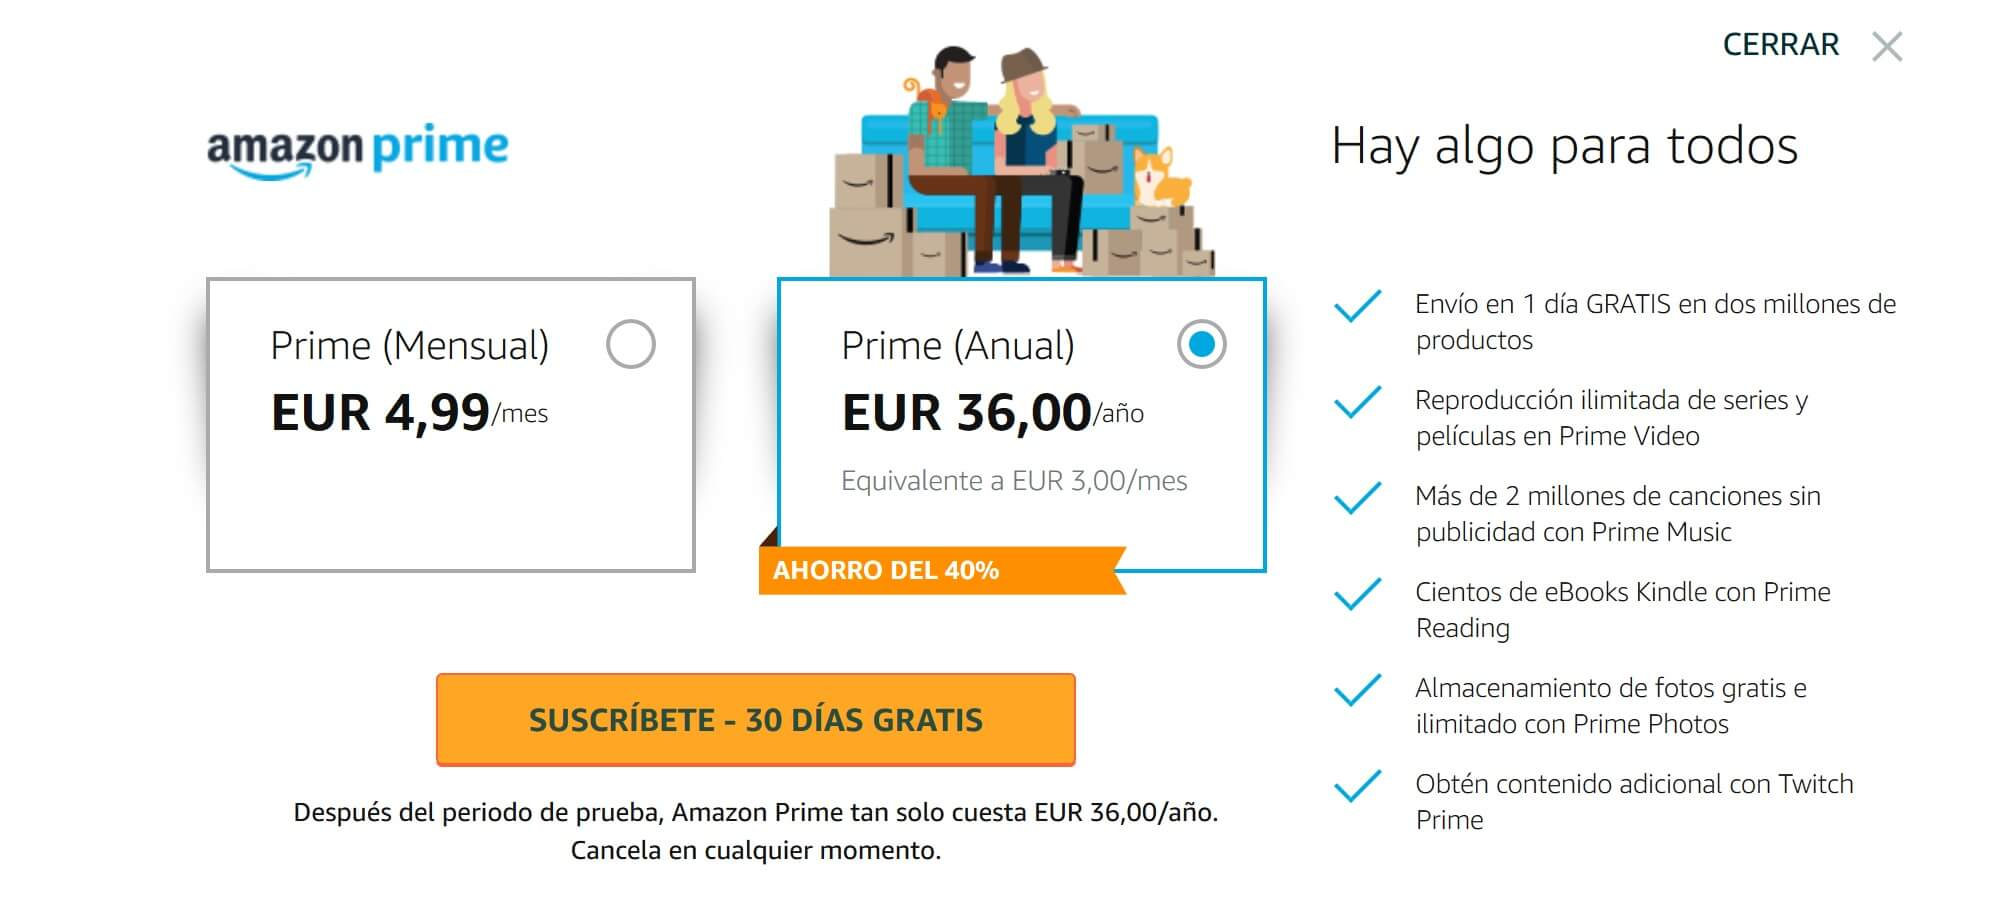 amazon prime tarifa españa